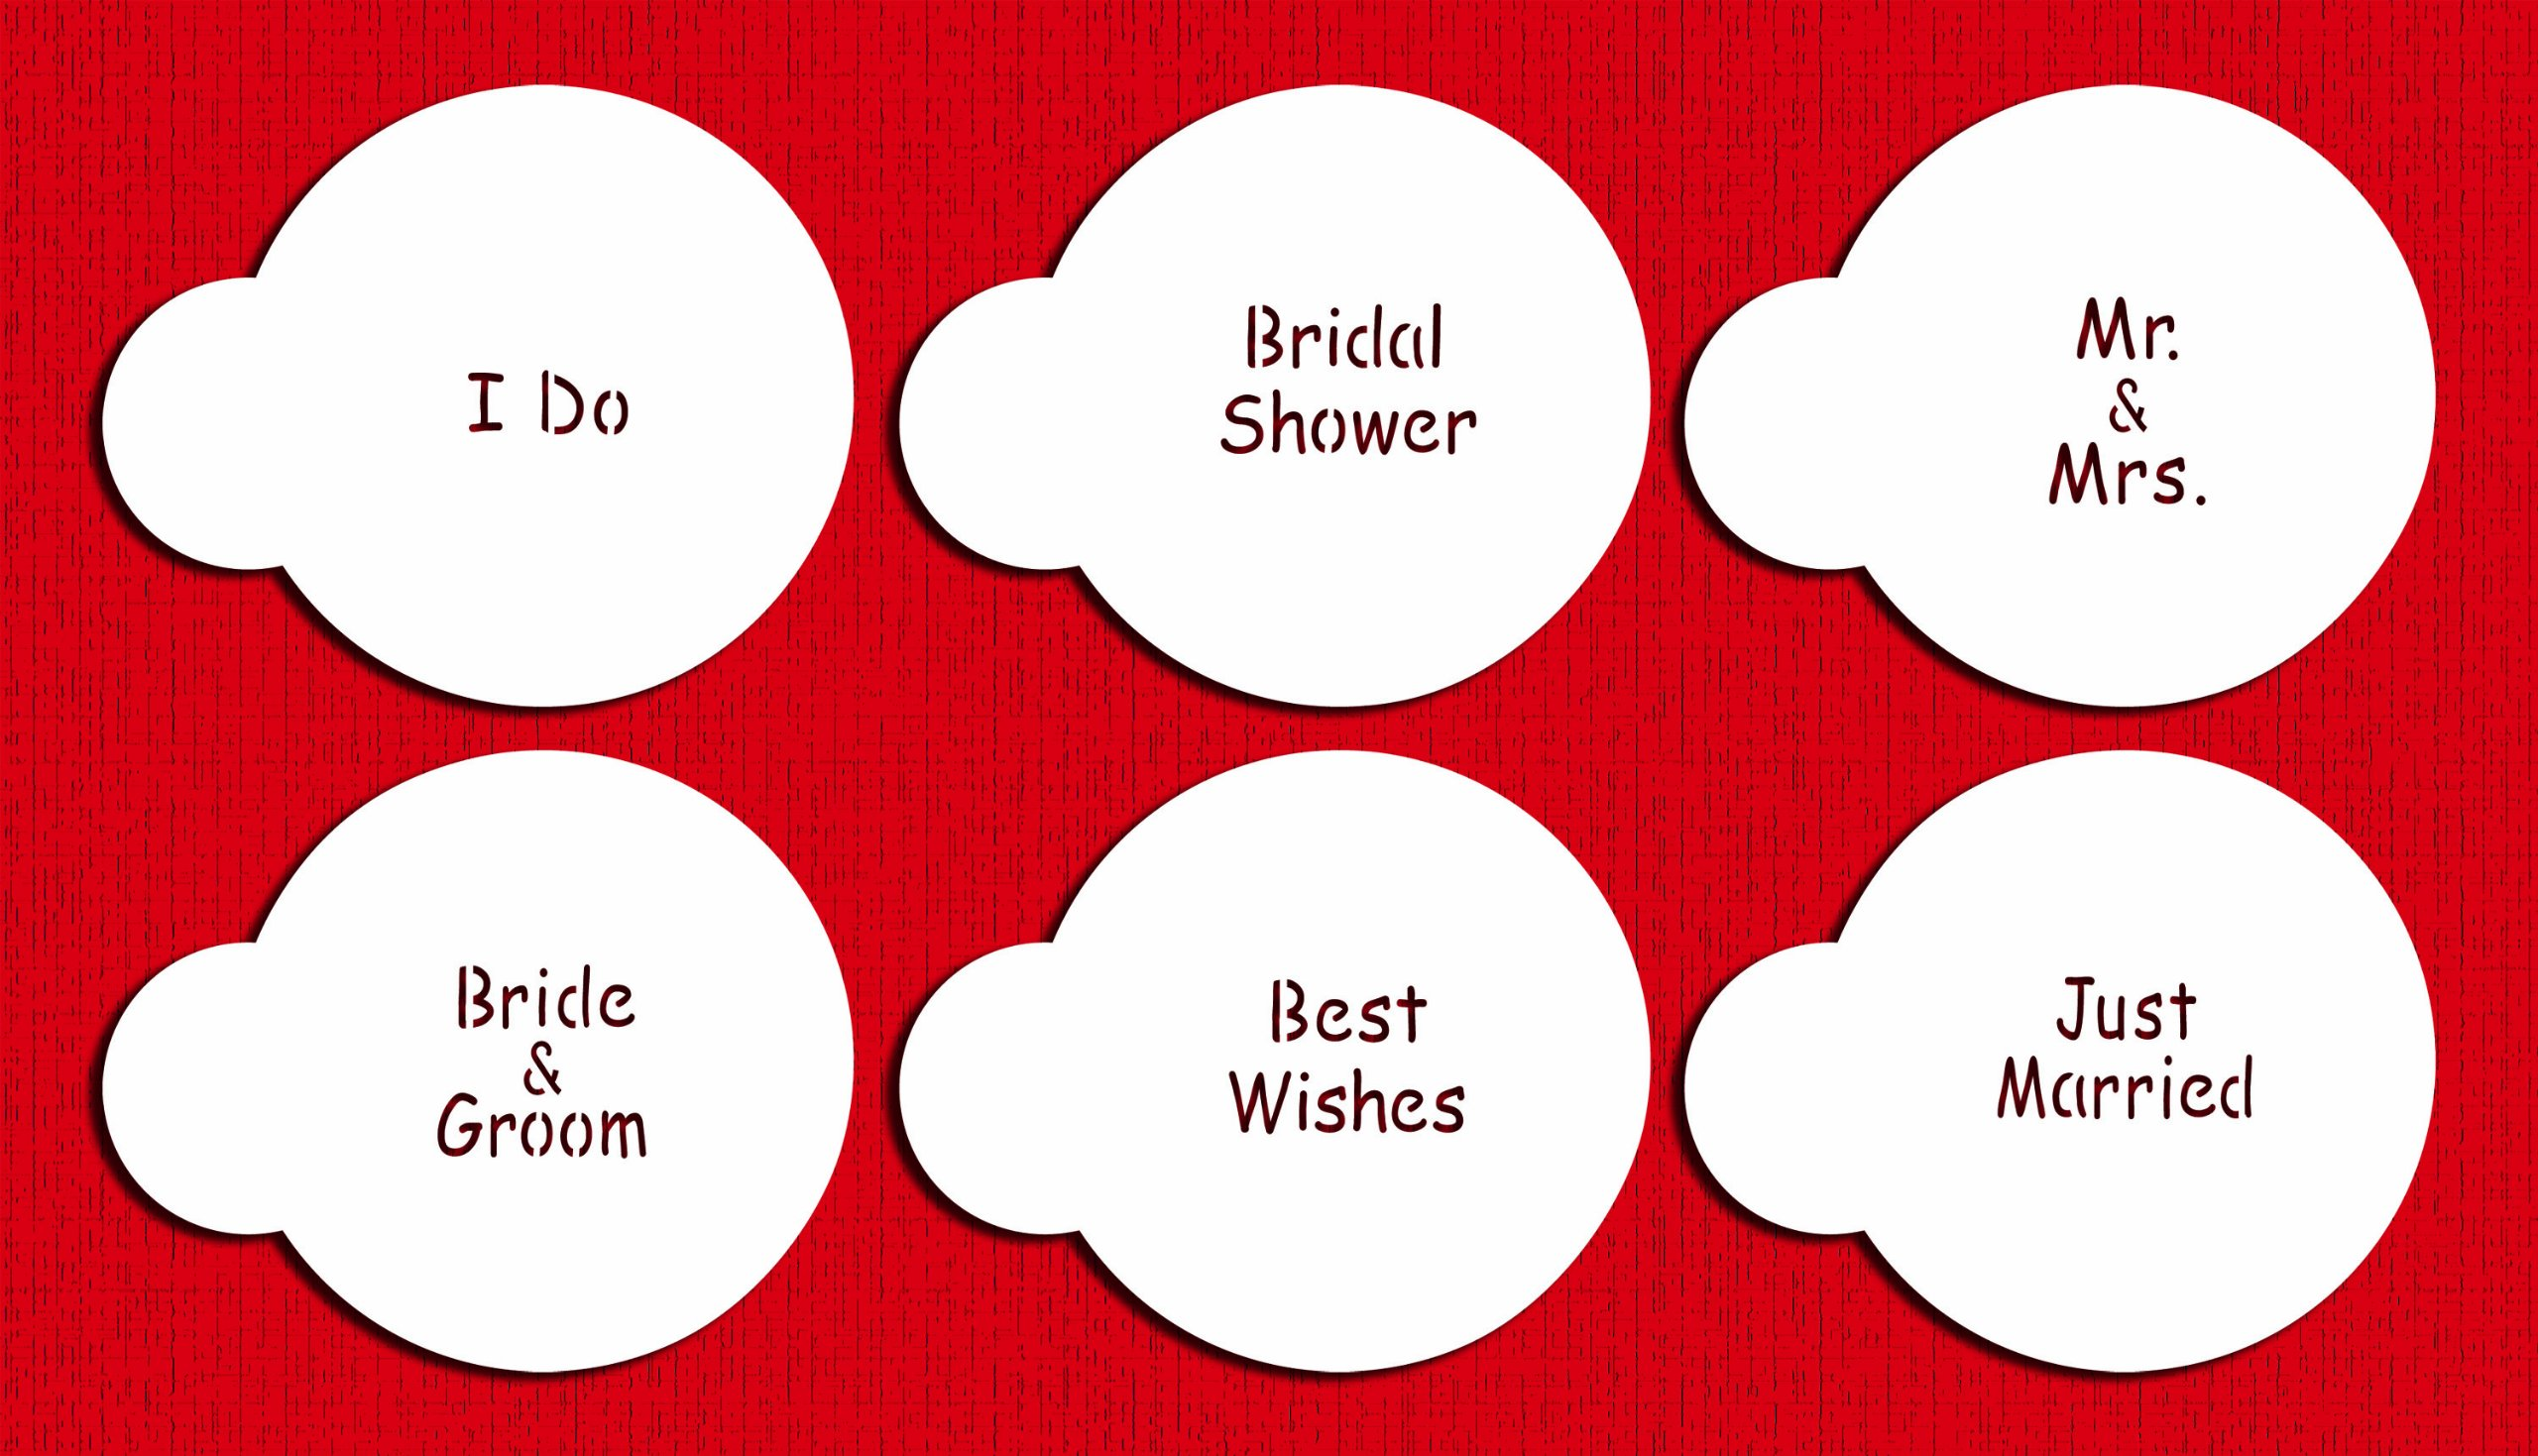 Designer Stencils C826 Wedding Lettering Cookie Stencil Set, (BRIDE & GROOM - BEST WISHES - JUST MARRIED - I DO - BRIDAL SHOWER - MR. & MRS) Beige/semi-transparent